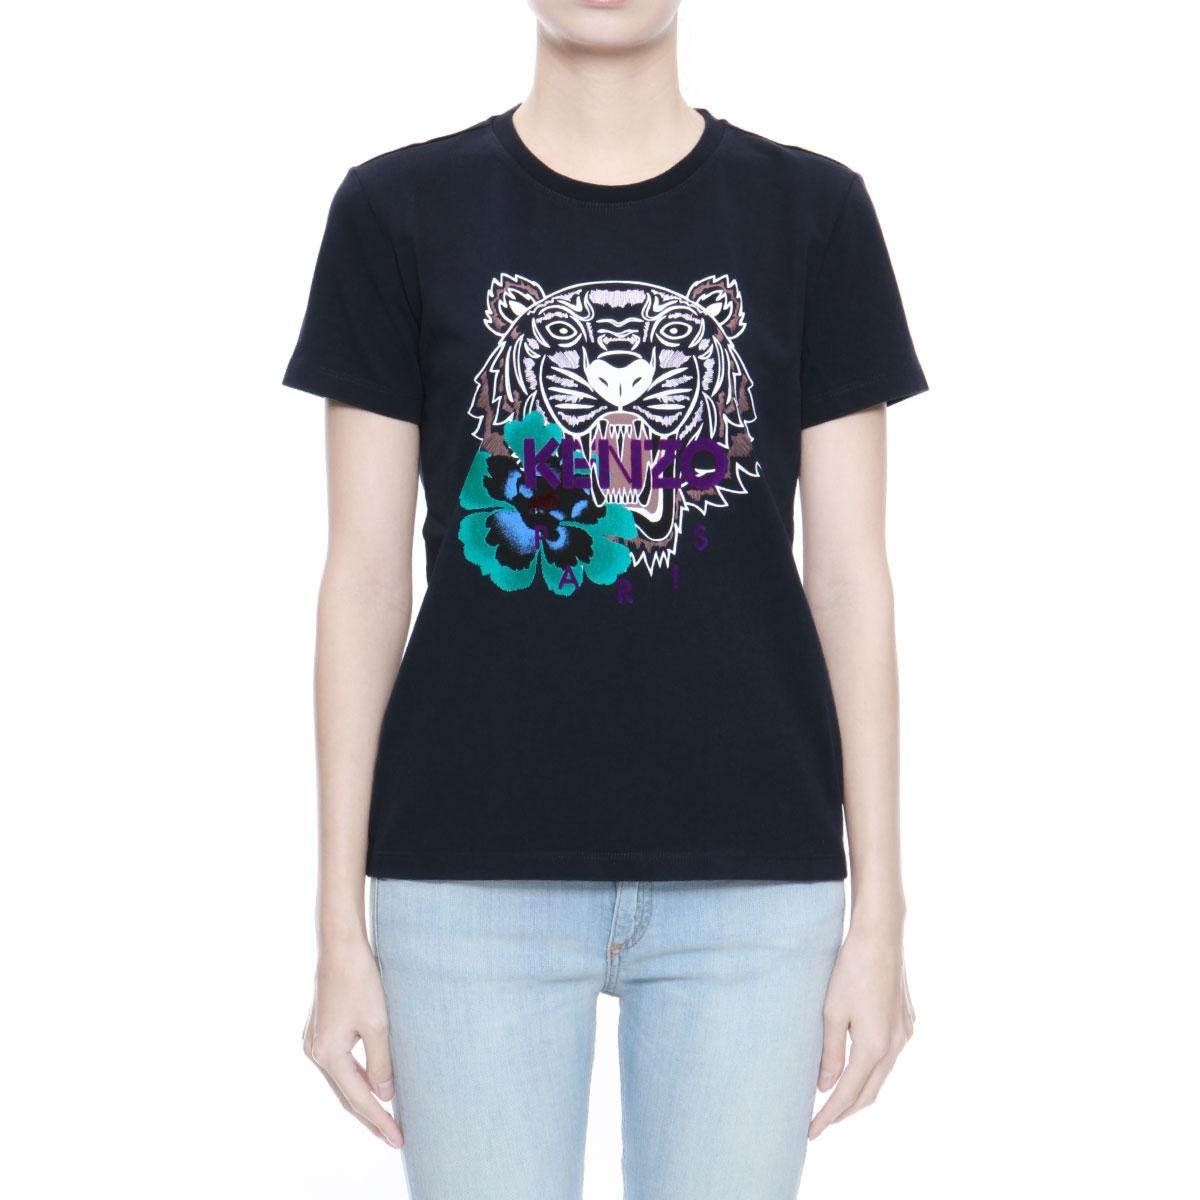 1d94c33855 楽天市場】ケンゾー KENZO Tシャツ レディース 2TS7634YG 78 半袖Tシャツ ...